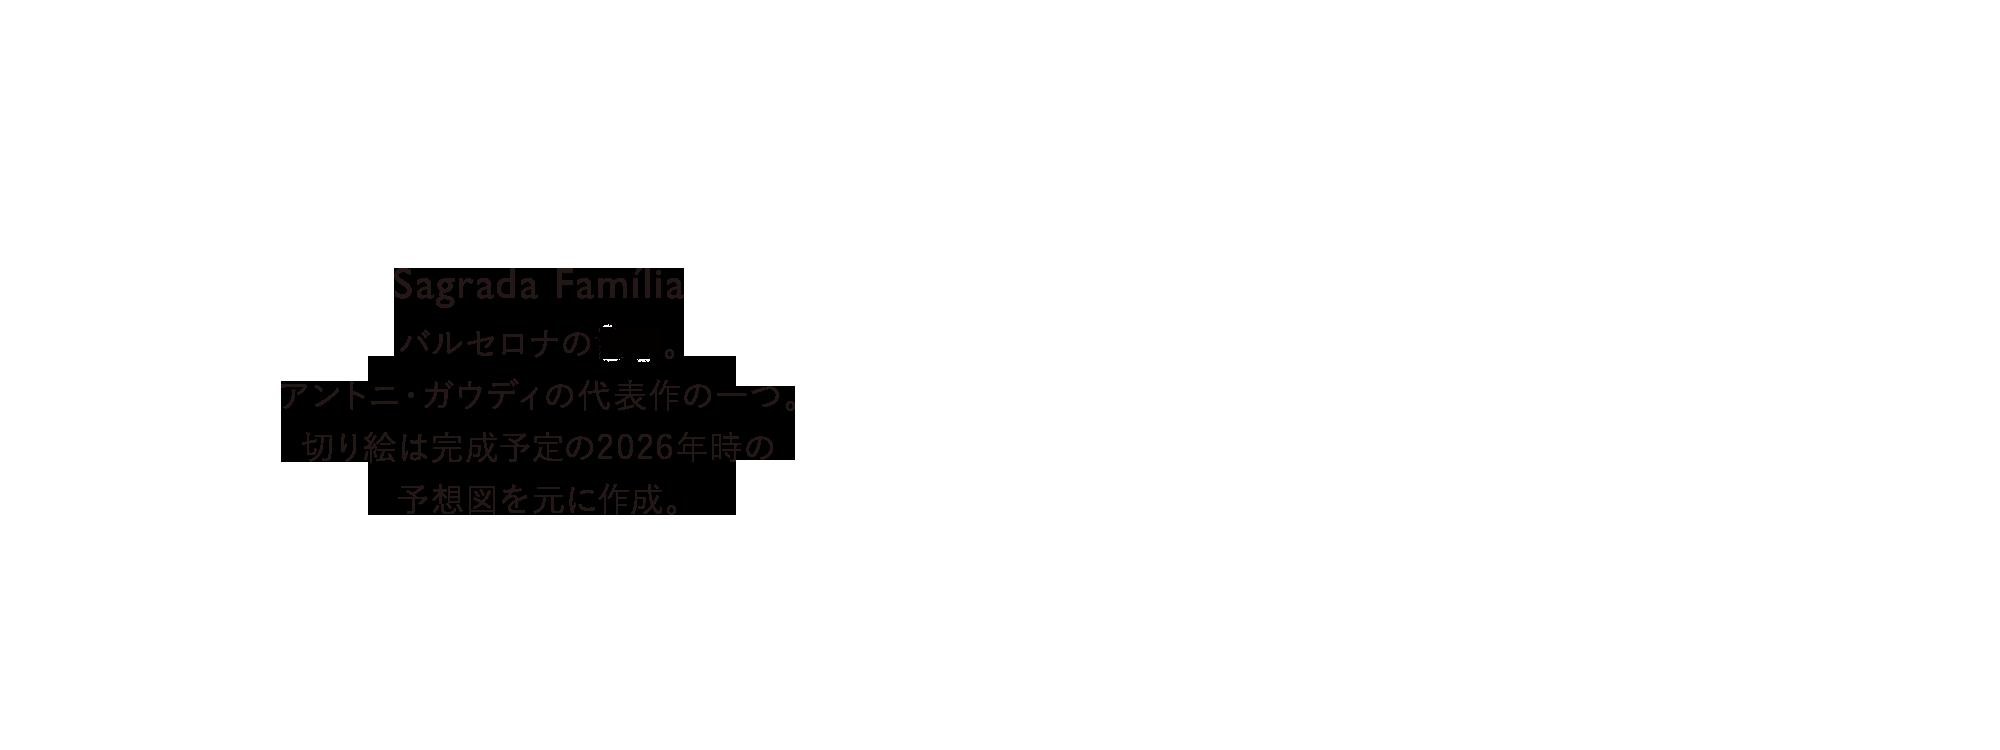 sagradafamilia_image_v2_txt